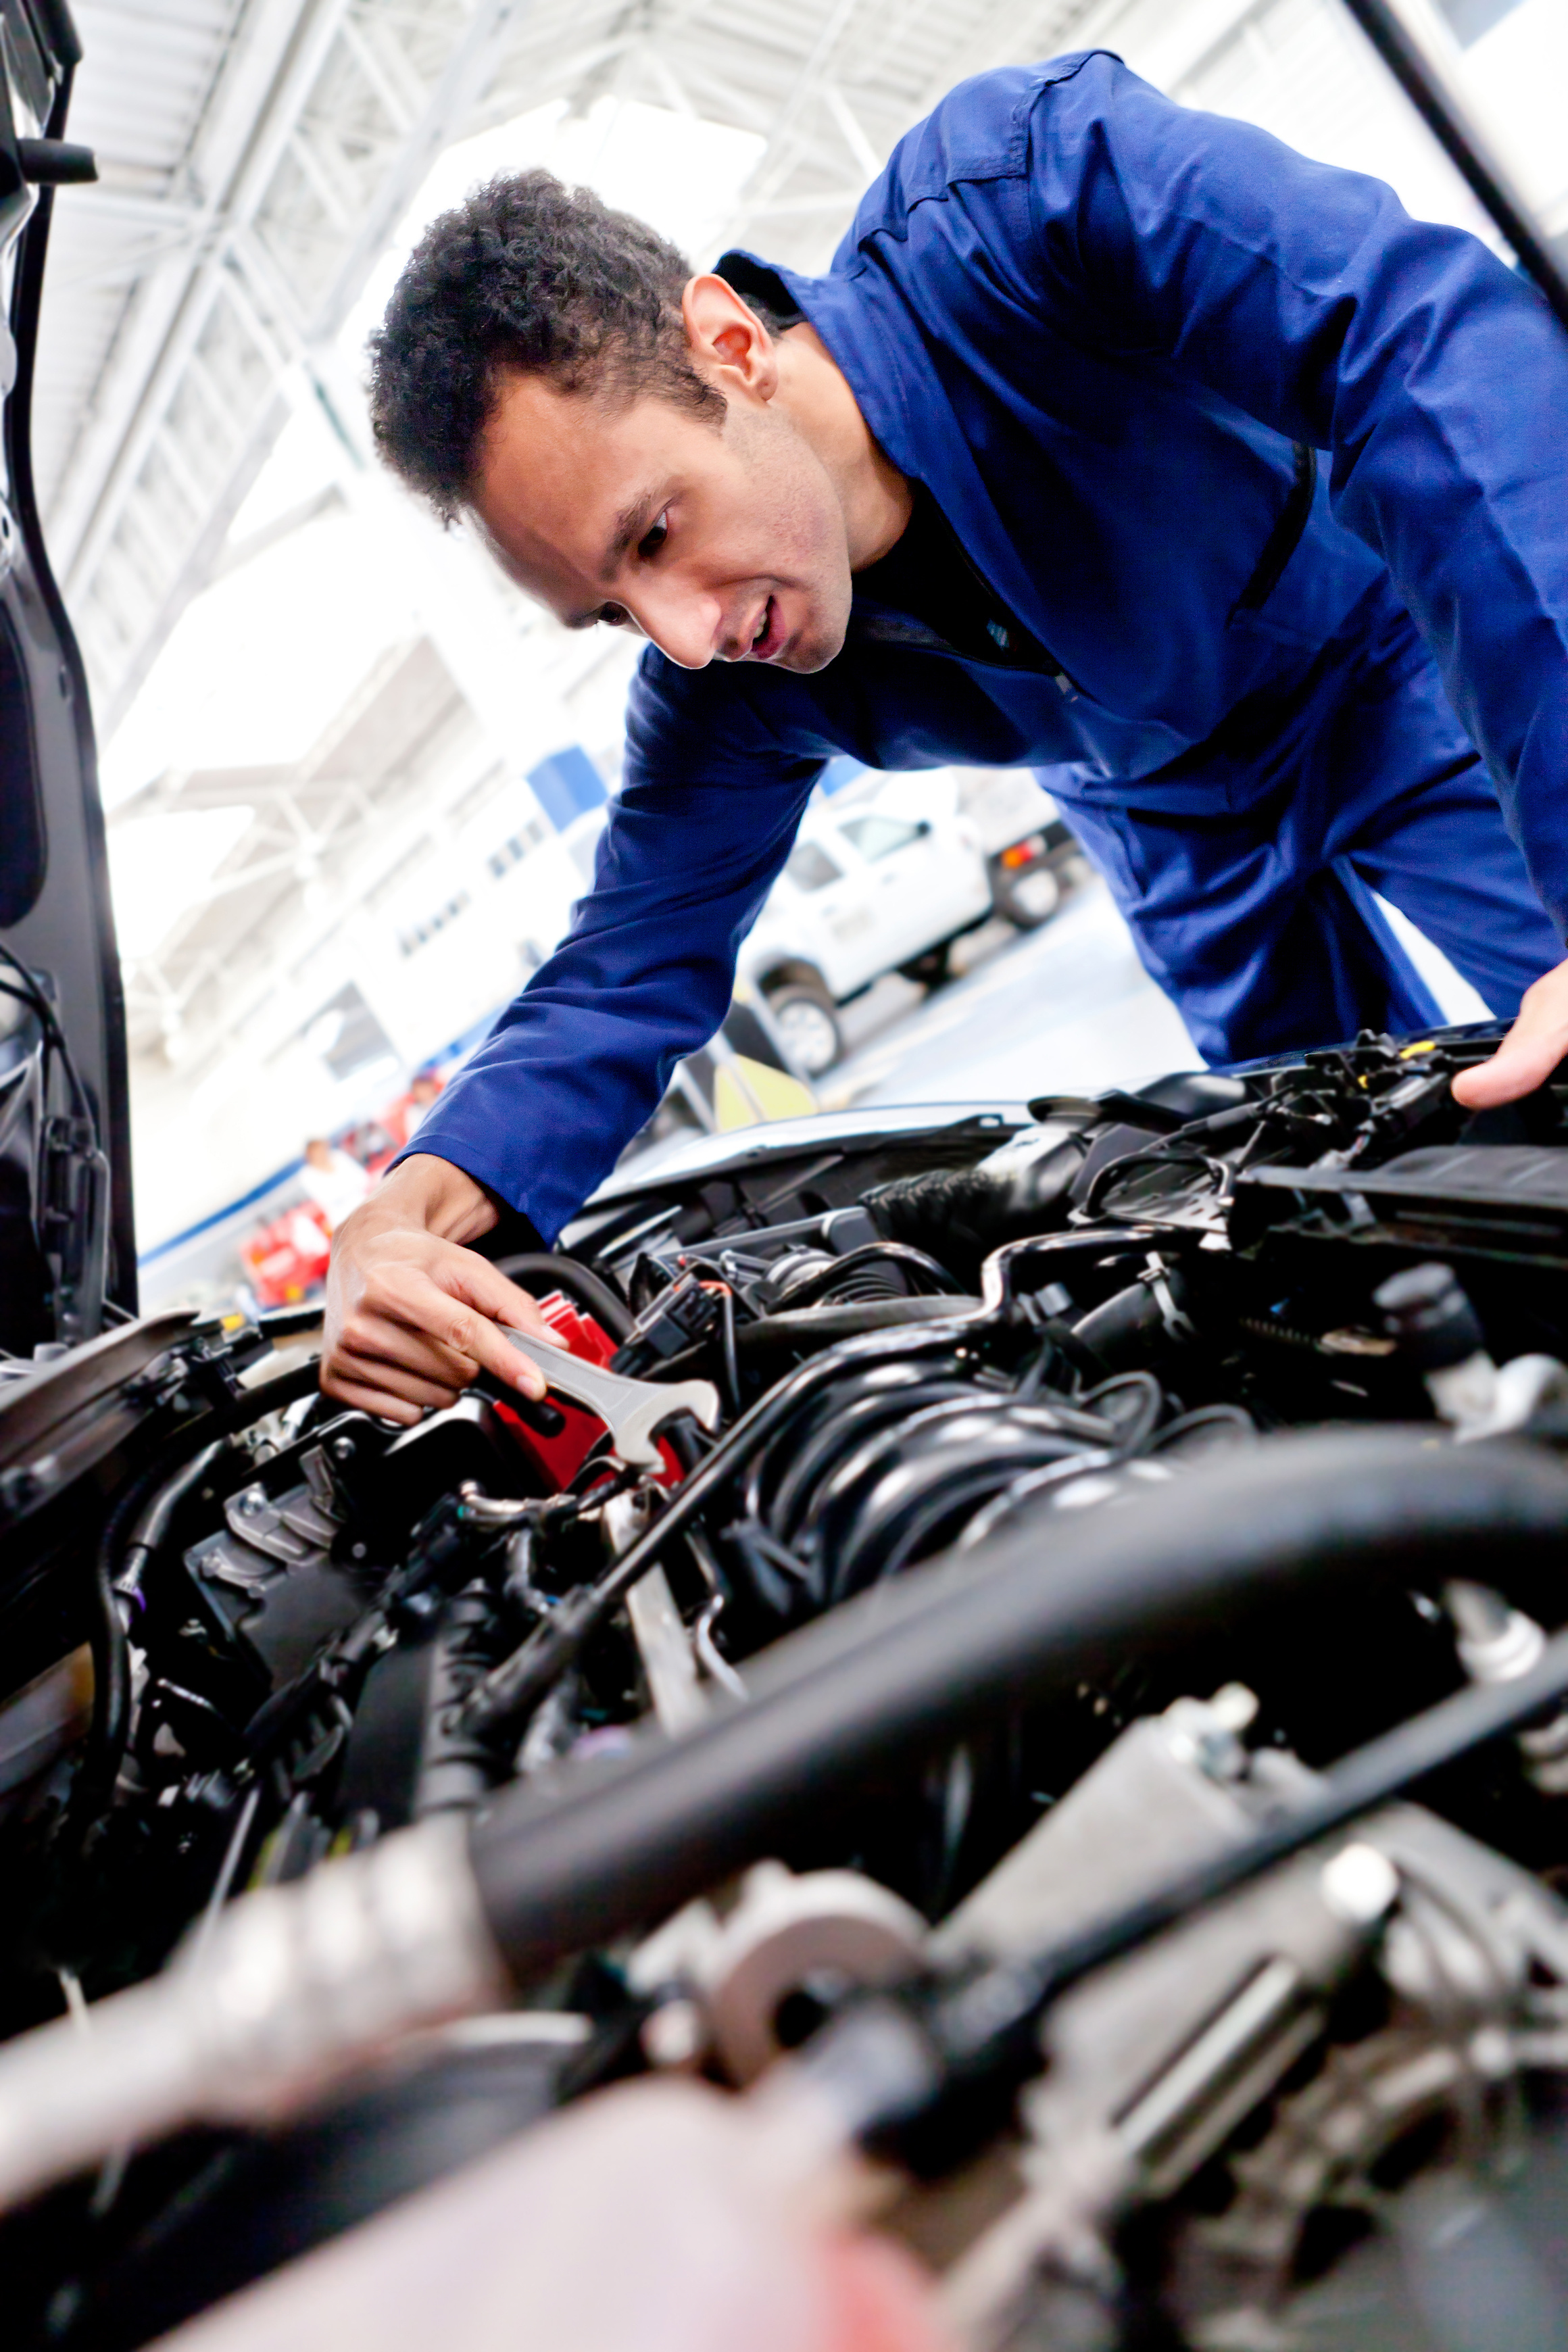 Expert Auto Mechanic